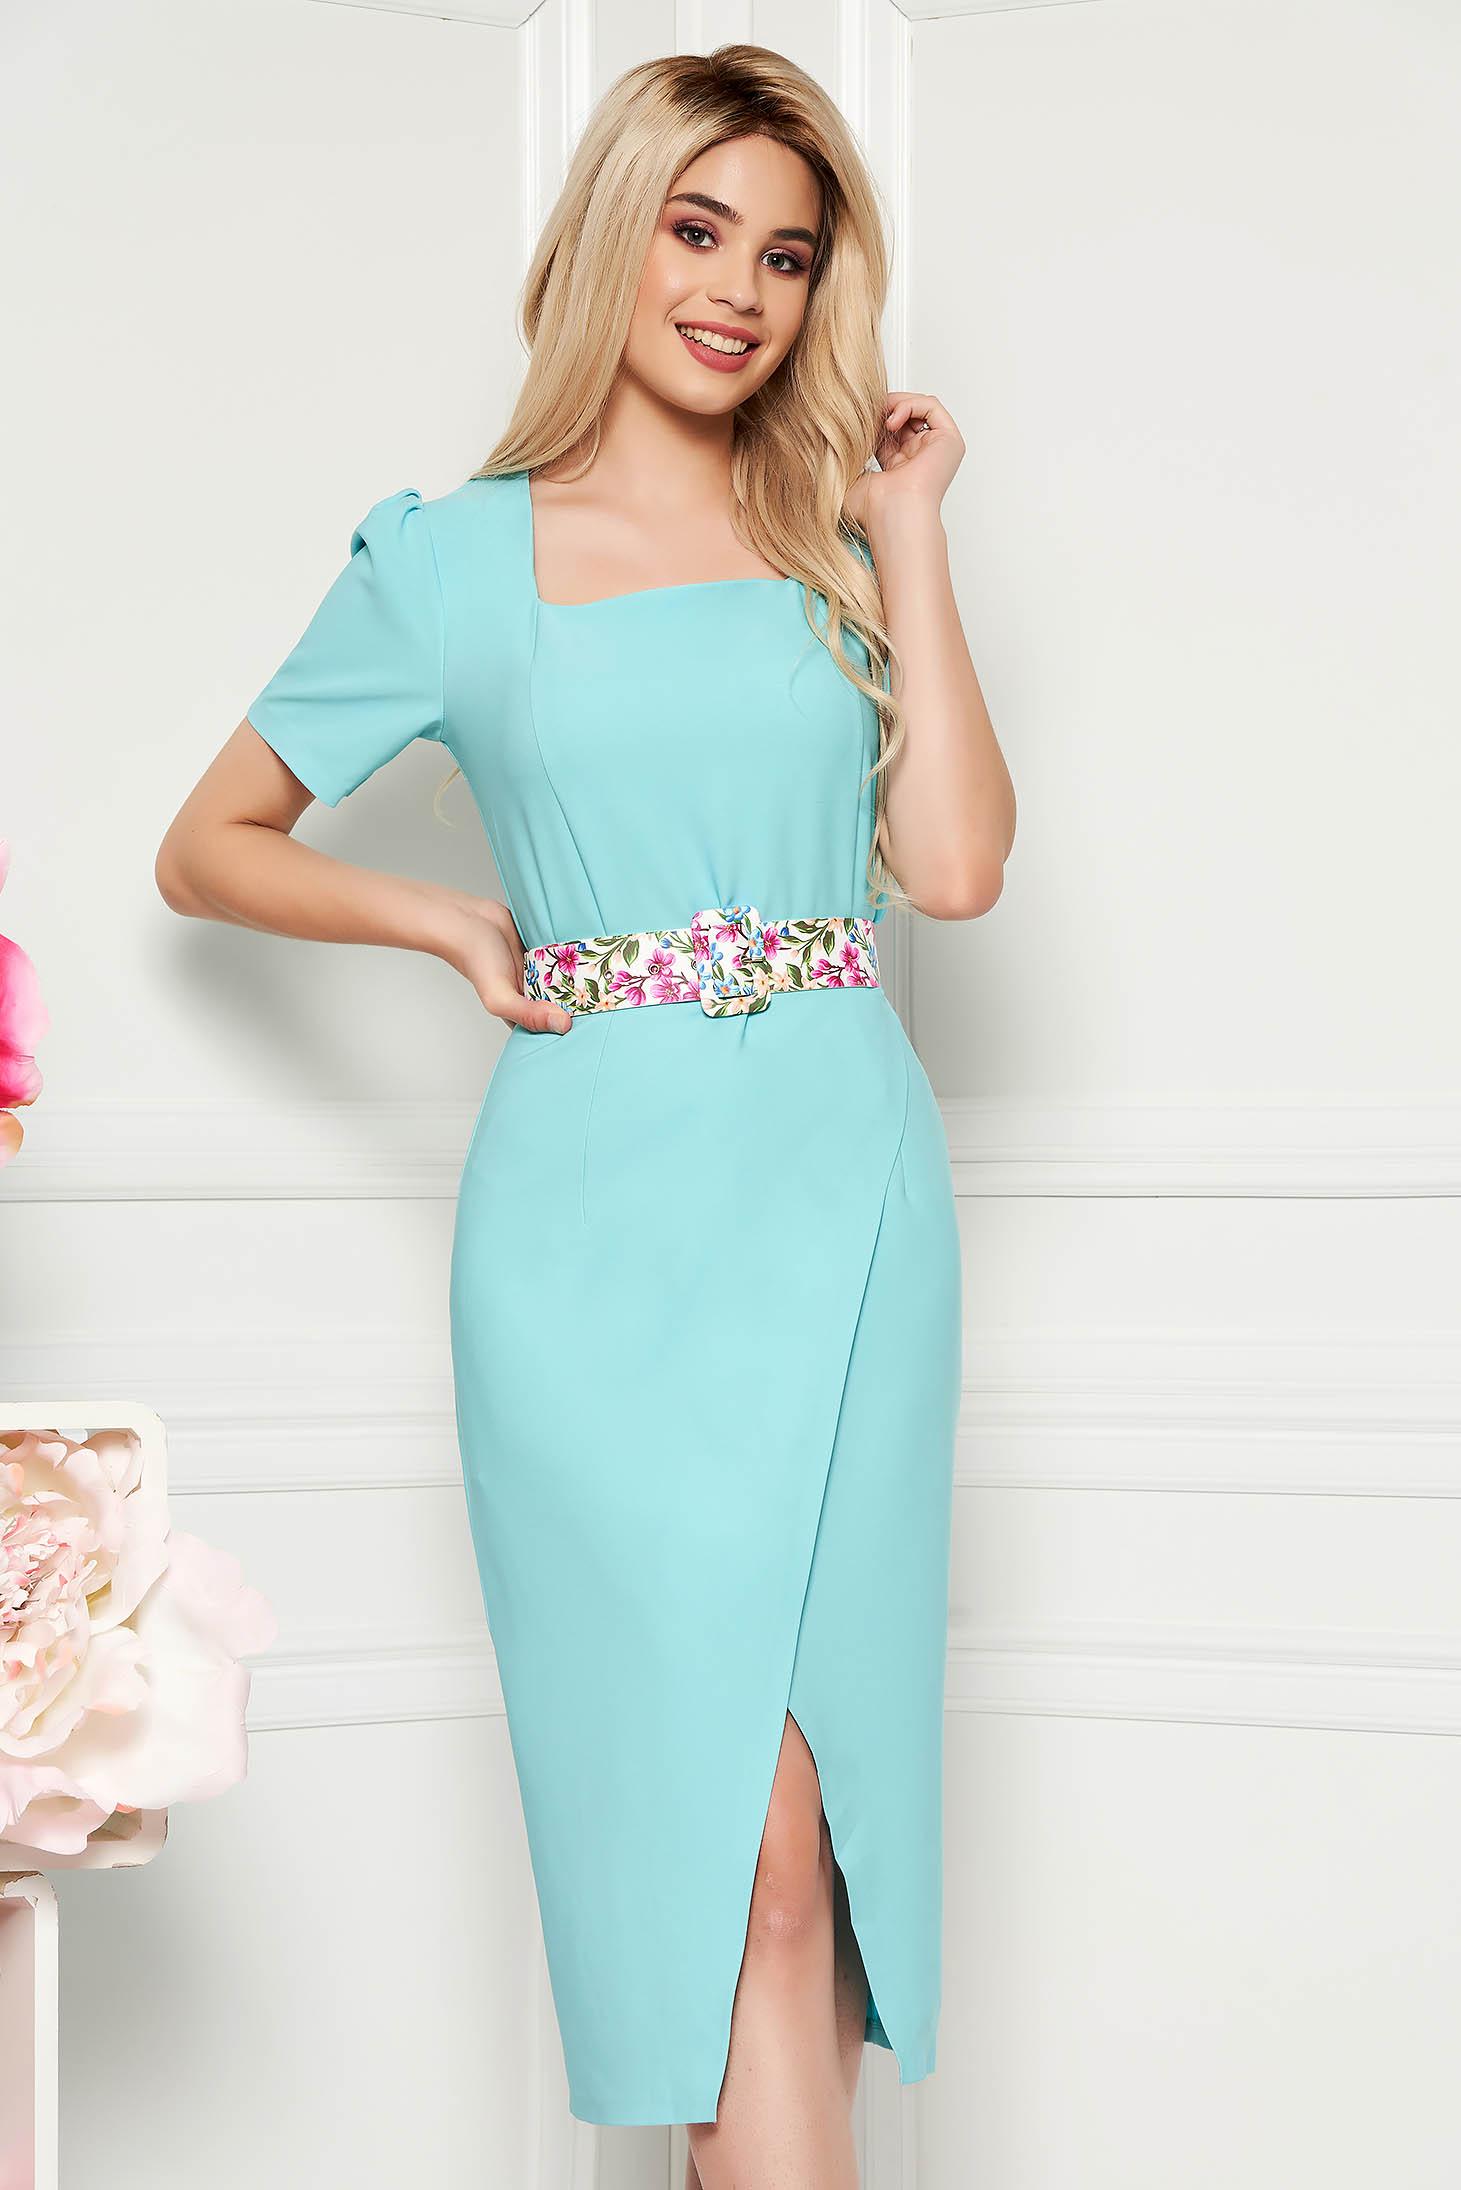 Rochie albastru aqua eleganta midi de zi cu un croi cambrat din material usor elastic cu accesoriu tip curea